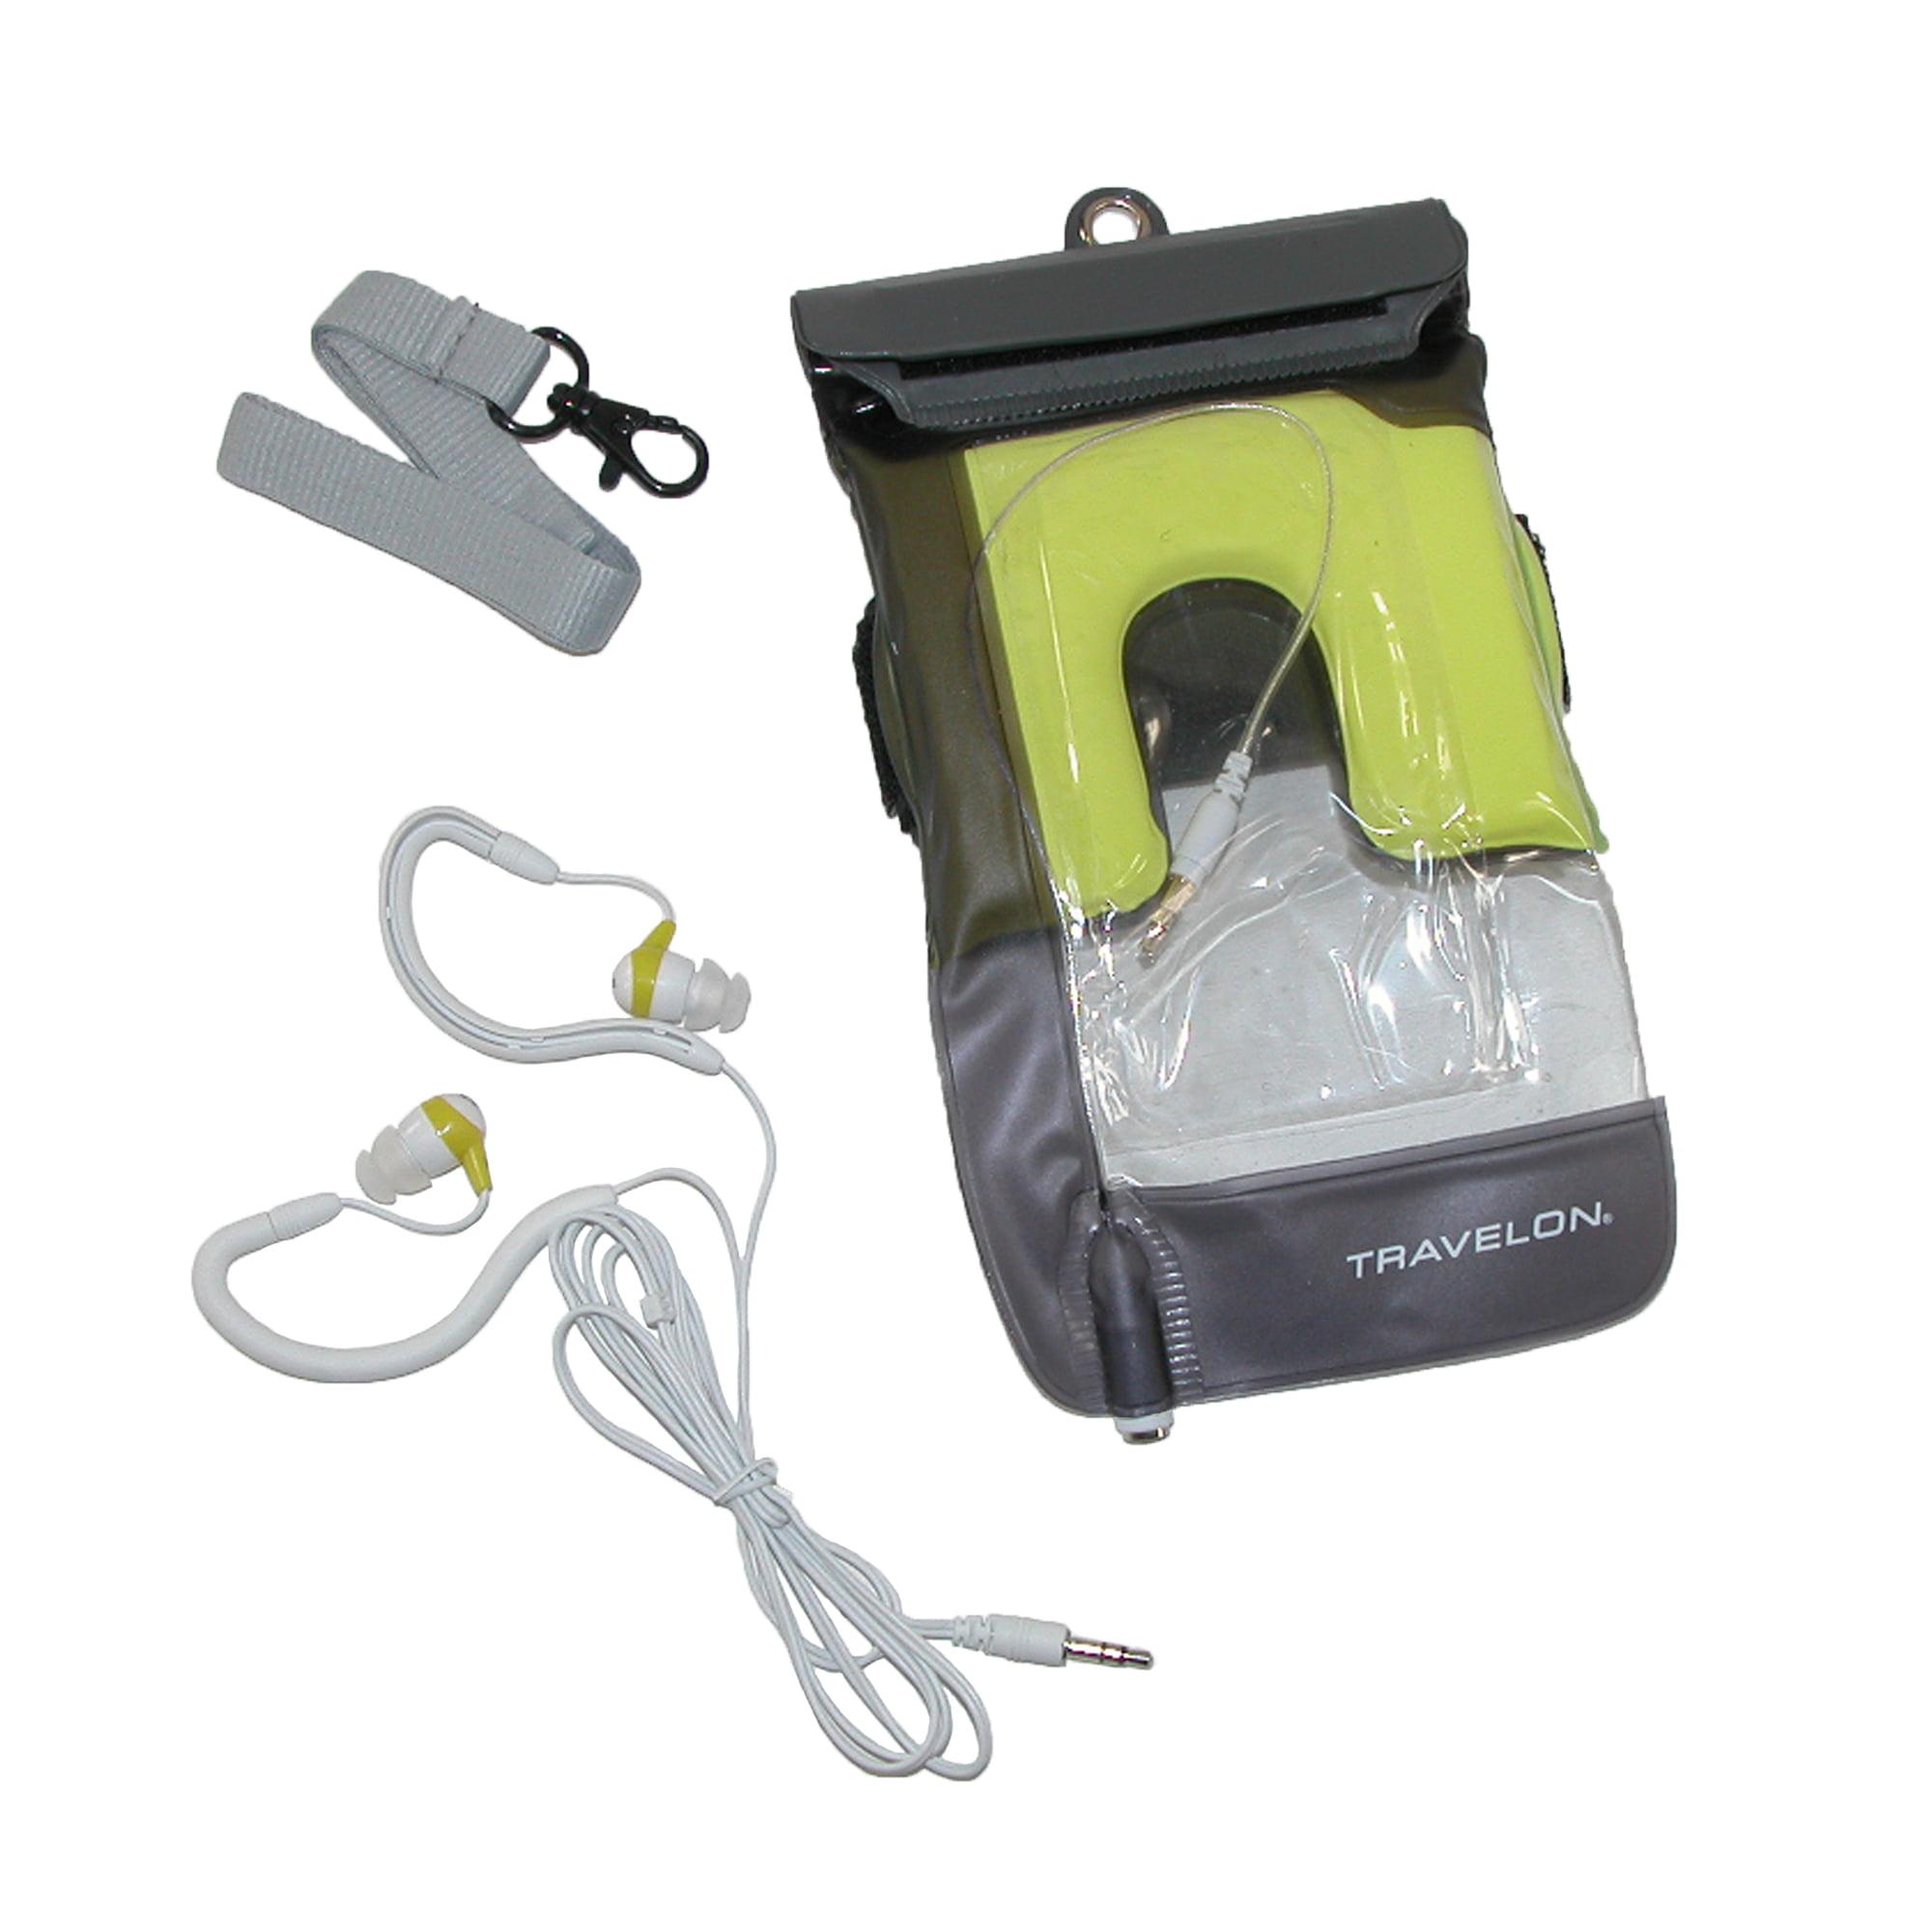 Waterproof Audio Jack and Waterproof Earbuds Smart Phone PouchCharcoal